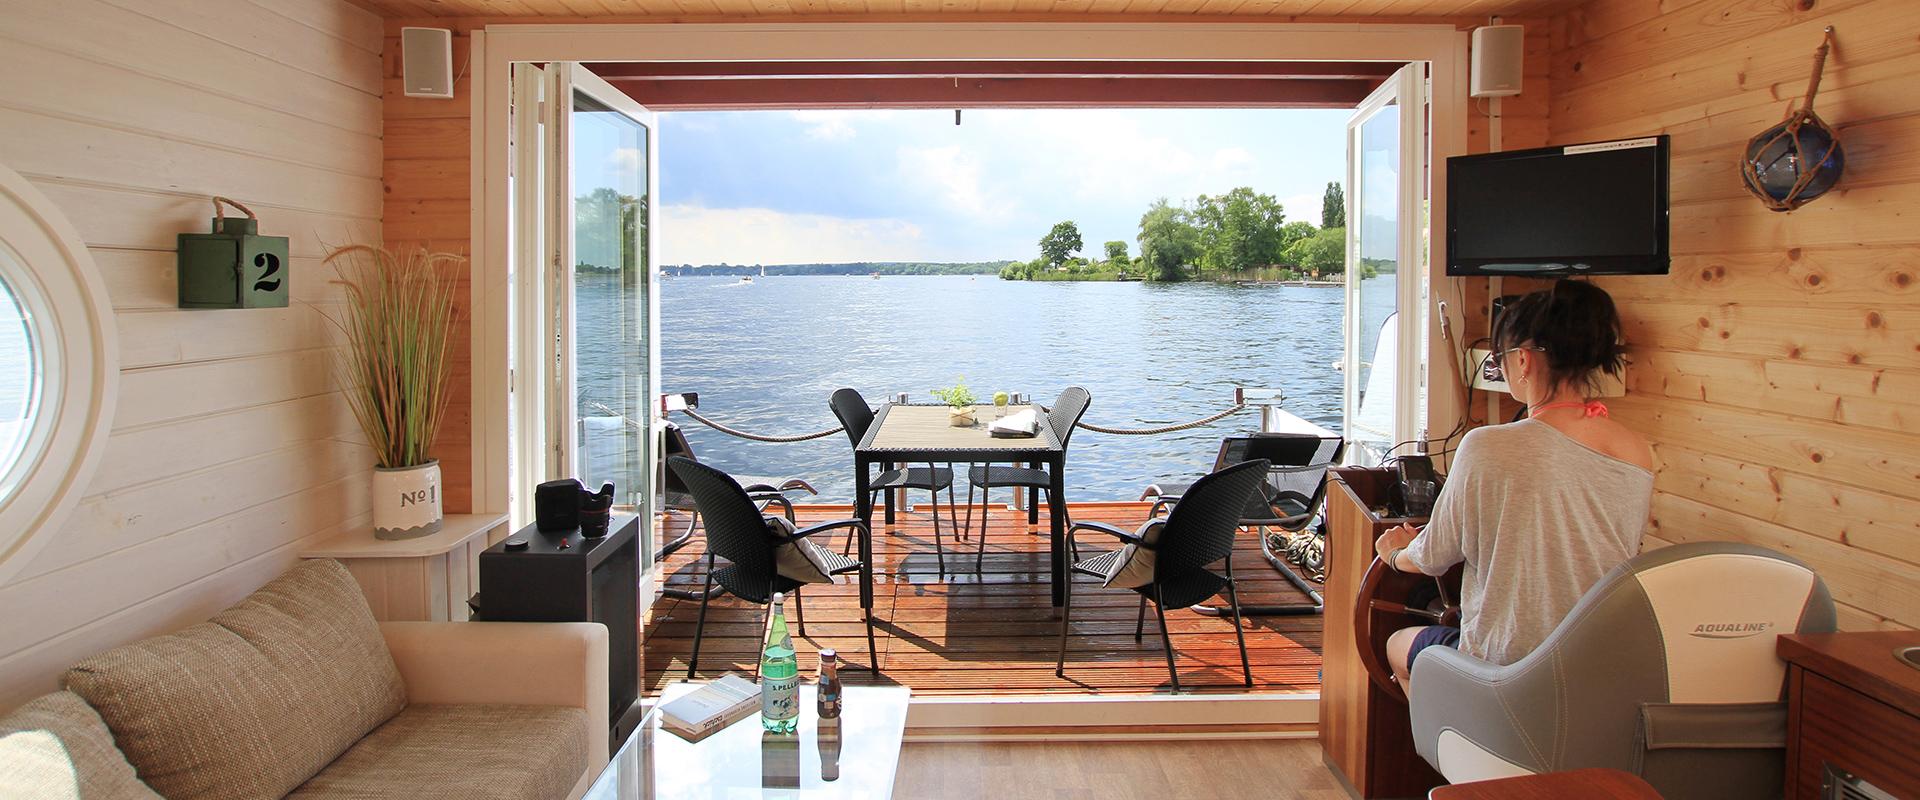 urlaub auf hausboot urlaub auf dem hausboot. Black Bedroom Furniture Sets. Home Design Ideas